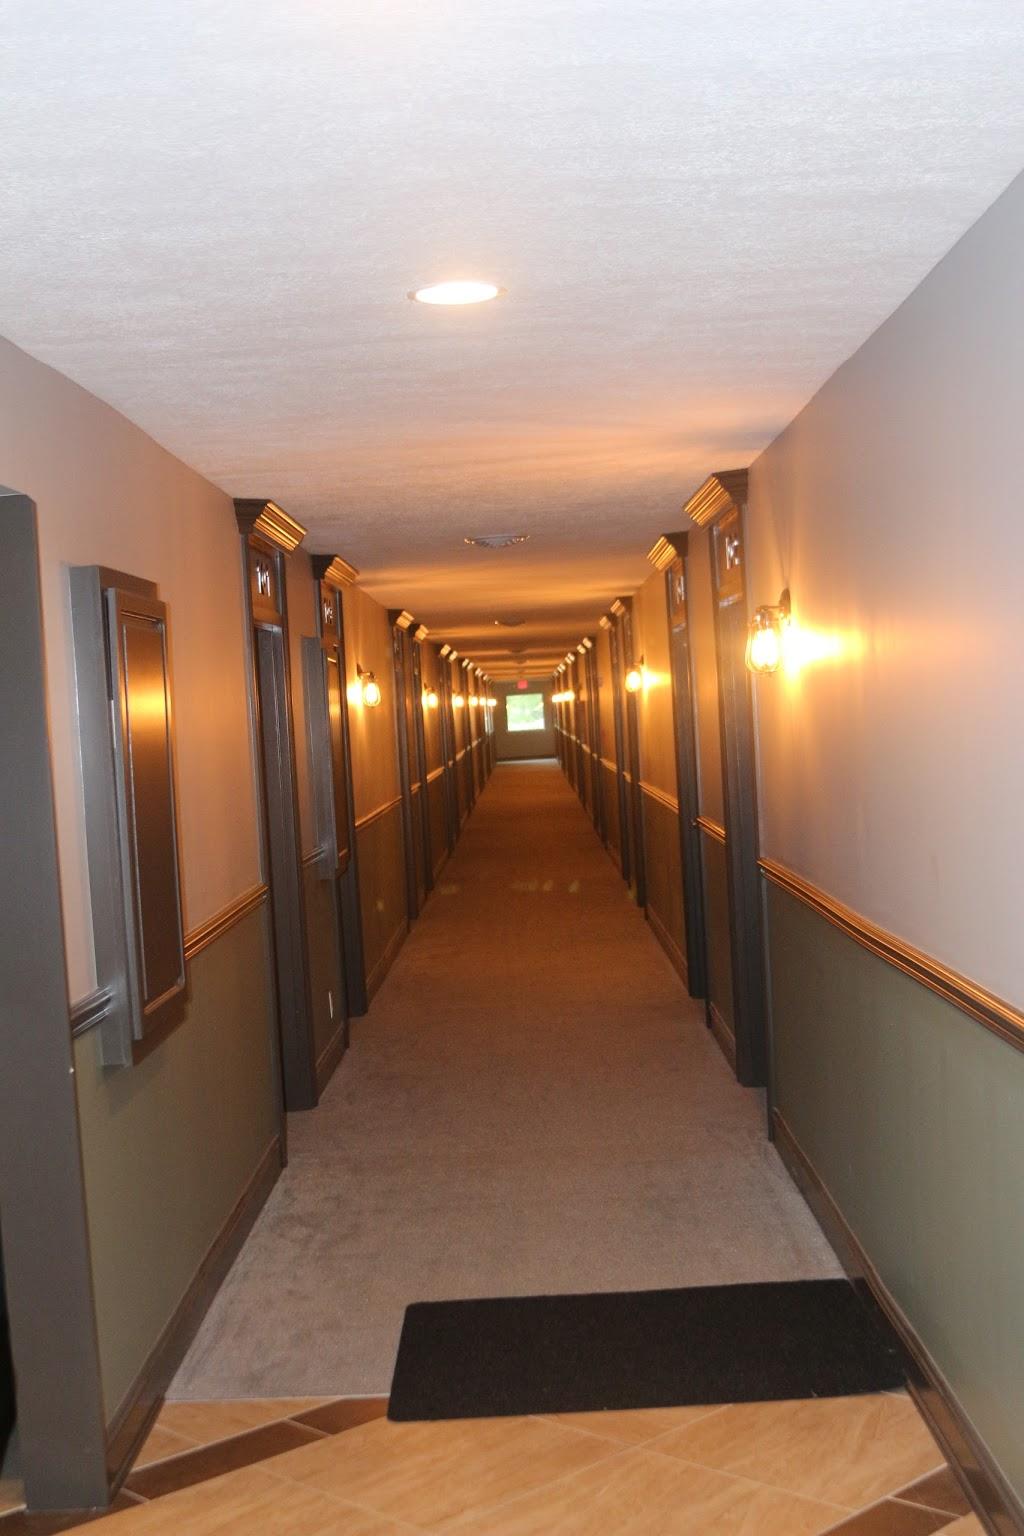 Inn Glenwood, LLC d/b/a/ HOTEL ARTHUR - lodging    Photo 4 of 10   Address: 707 S Locust St, Glenwood, IA 51534, USA   Phone: (712) 527-3175